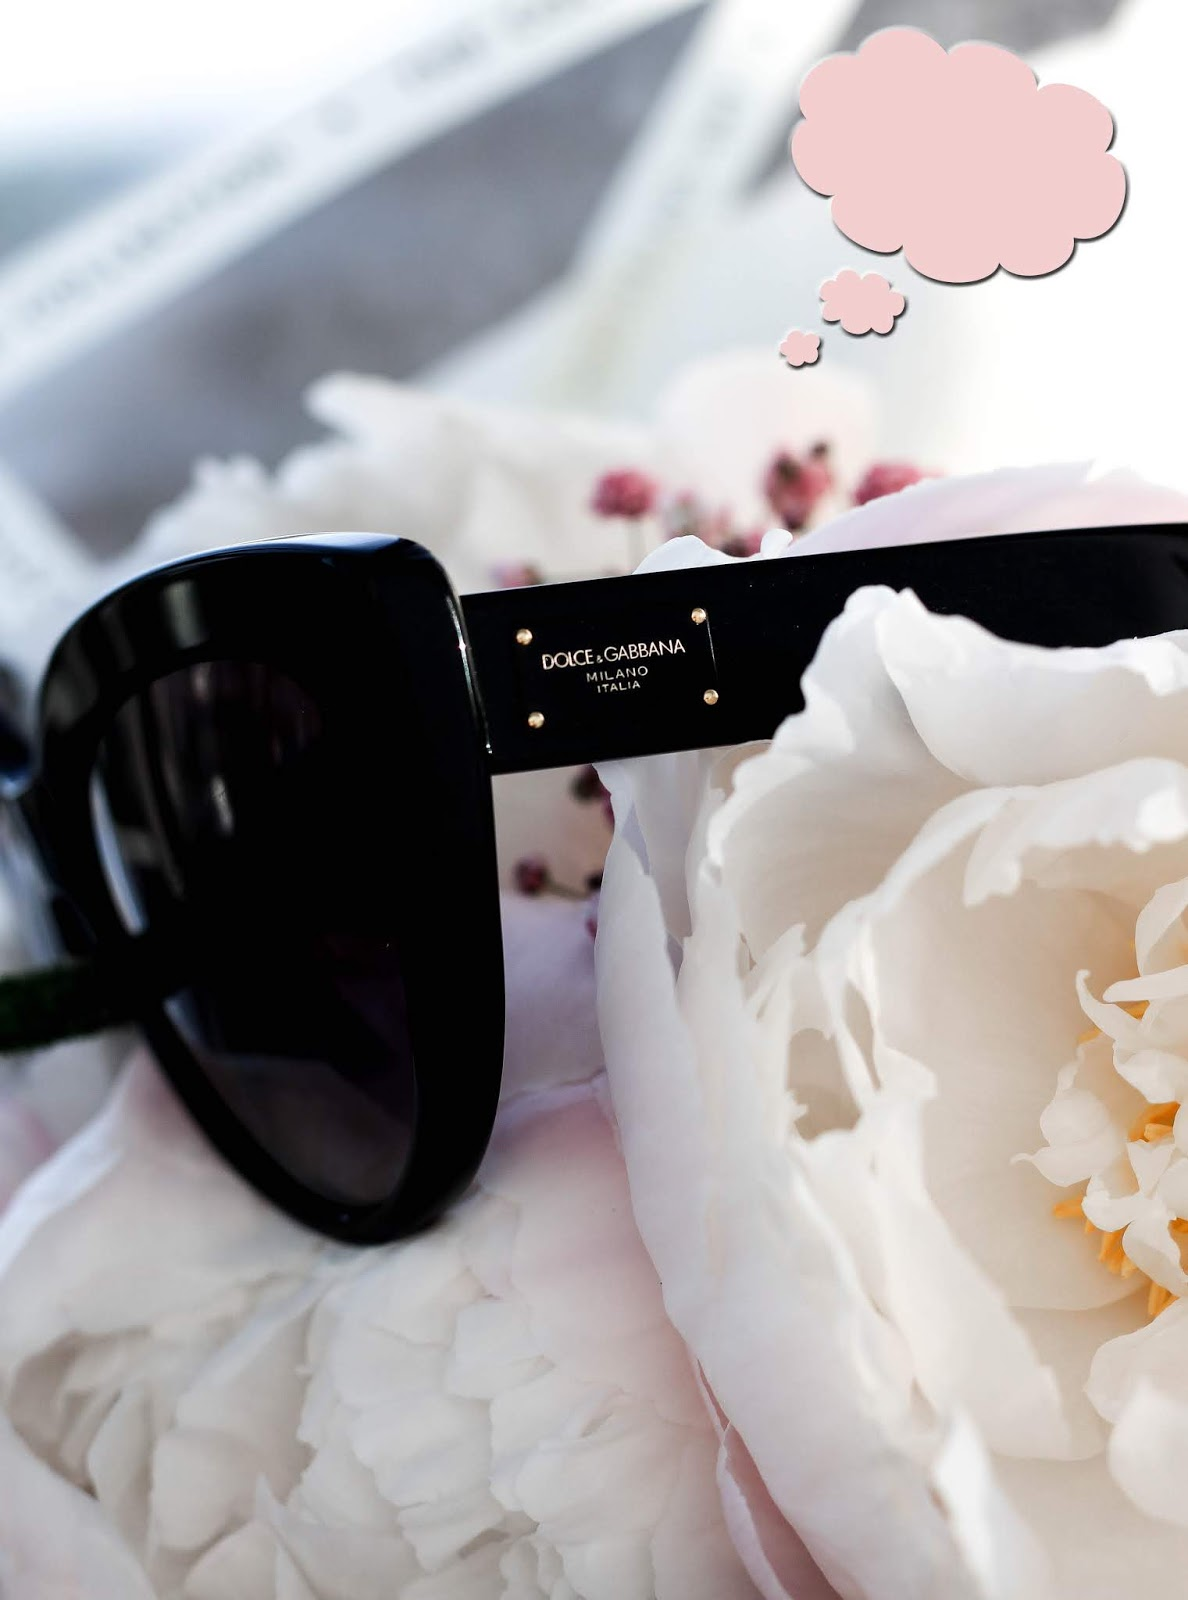 Eyewearbrands Dolce & Gabbana 4287 Black Sunglasses